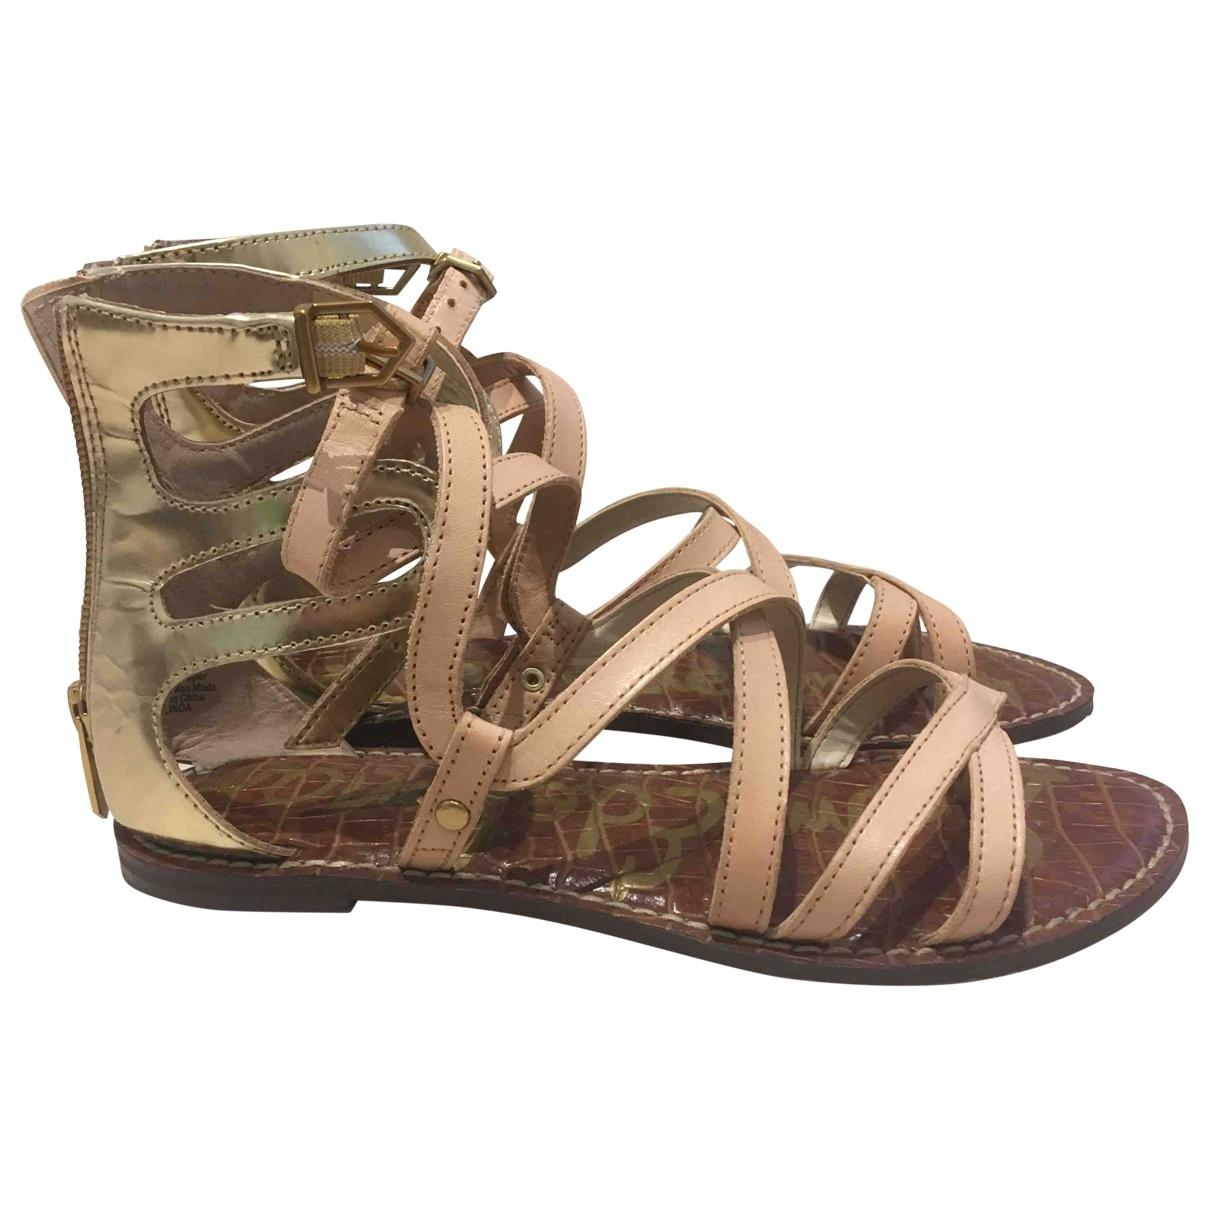 Sam Edelman \N Beige Leather Sandals for Women 36 EU